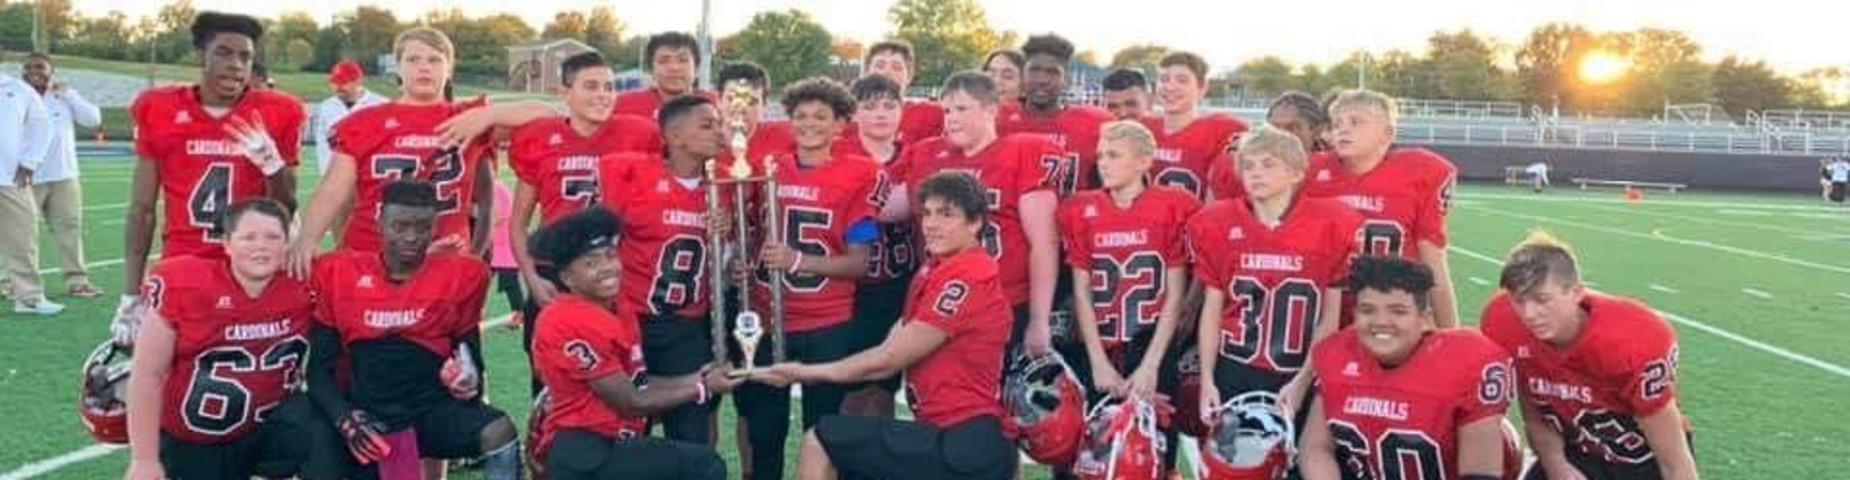 8th Grade Cardinals football players.